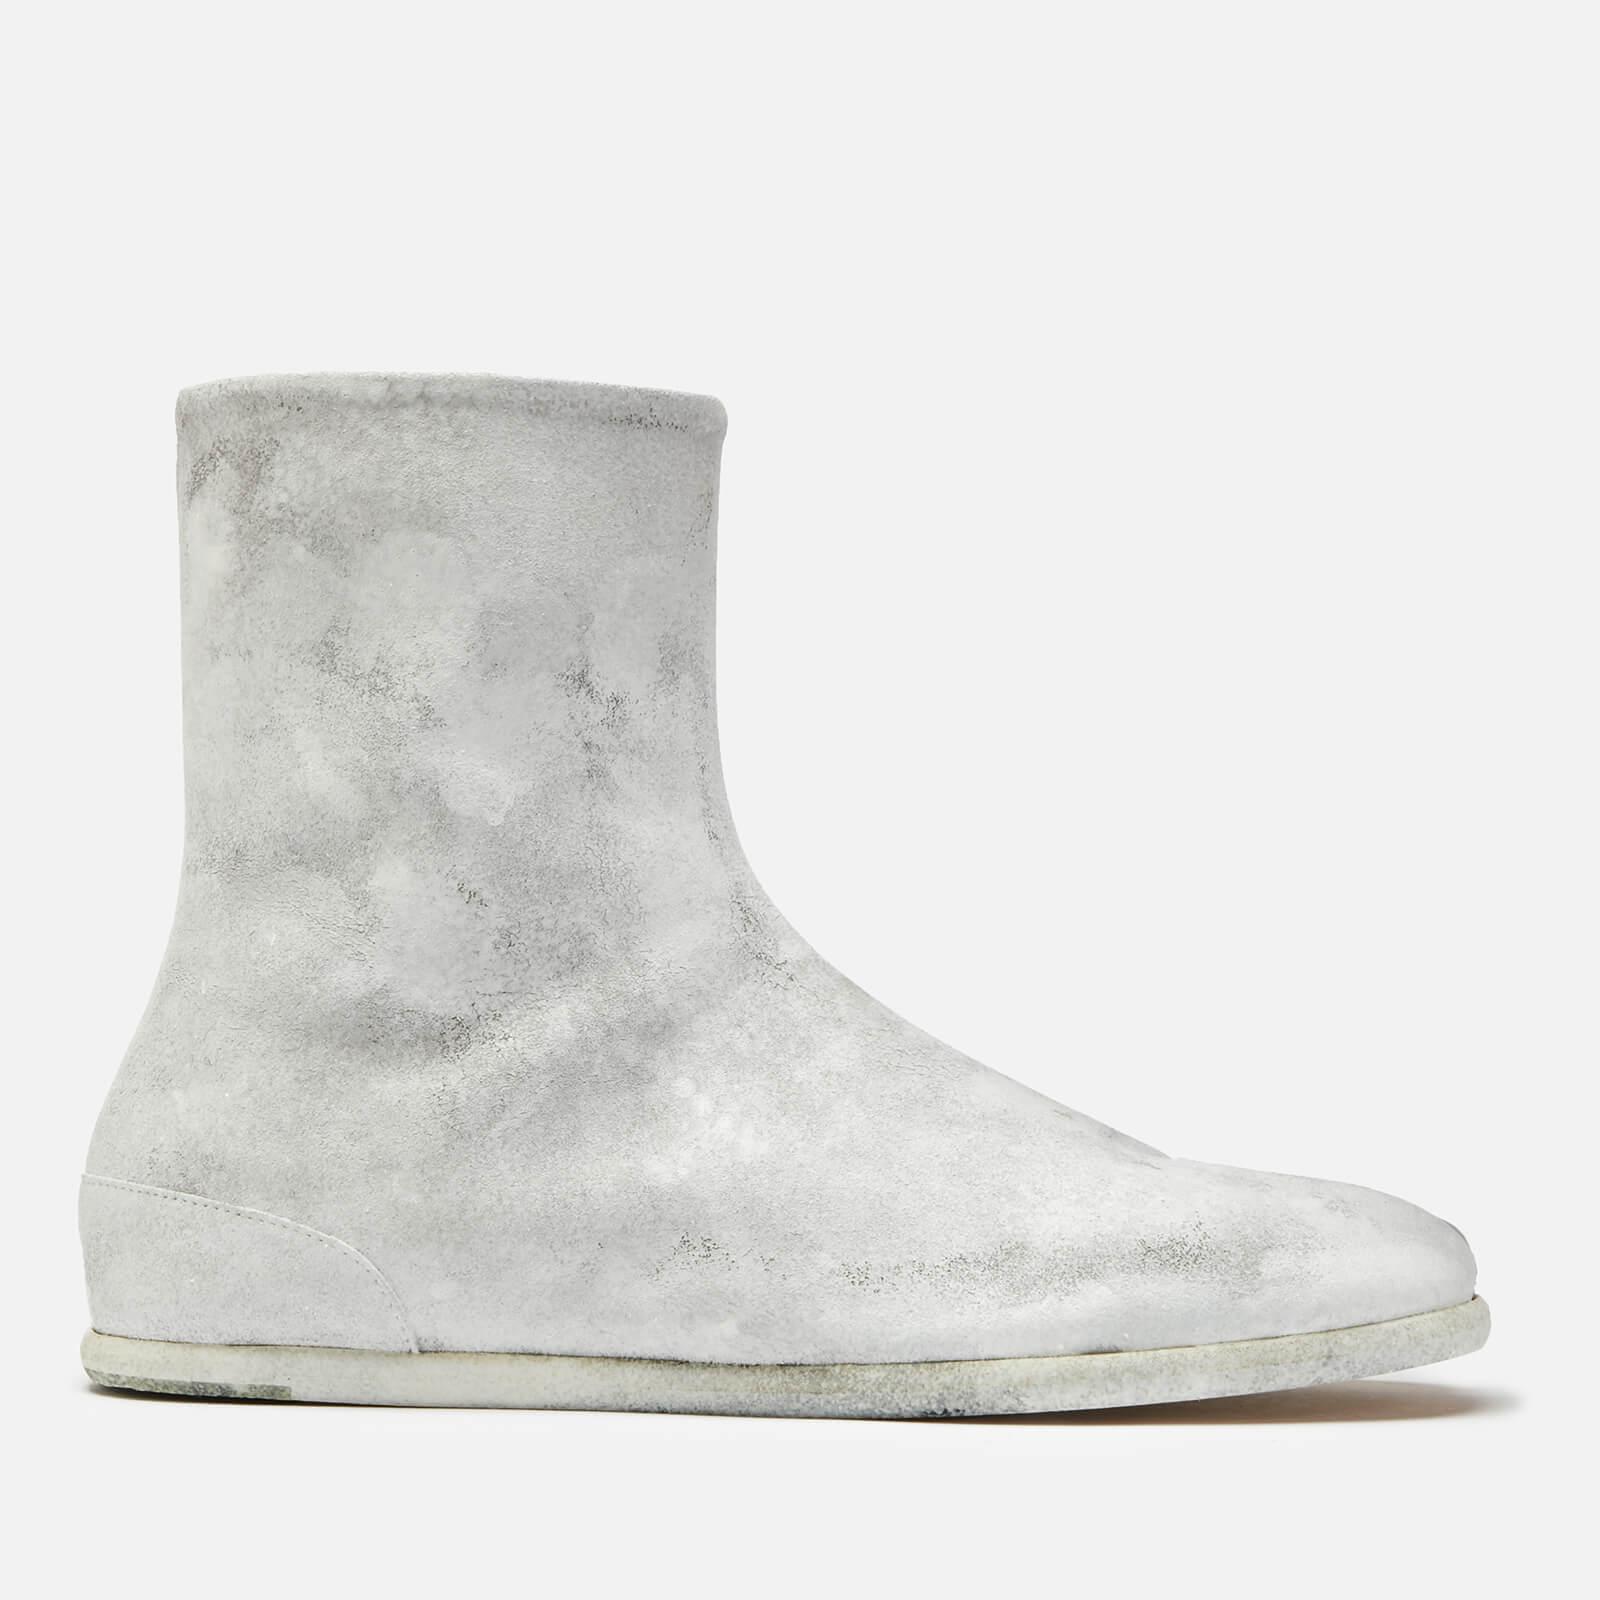 0b0b0eb13779e8 Maison Margiela Men's Tabi Ankle Flat Boots - White - Free UK Delivery over  £50